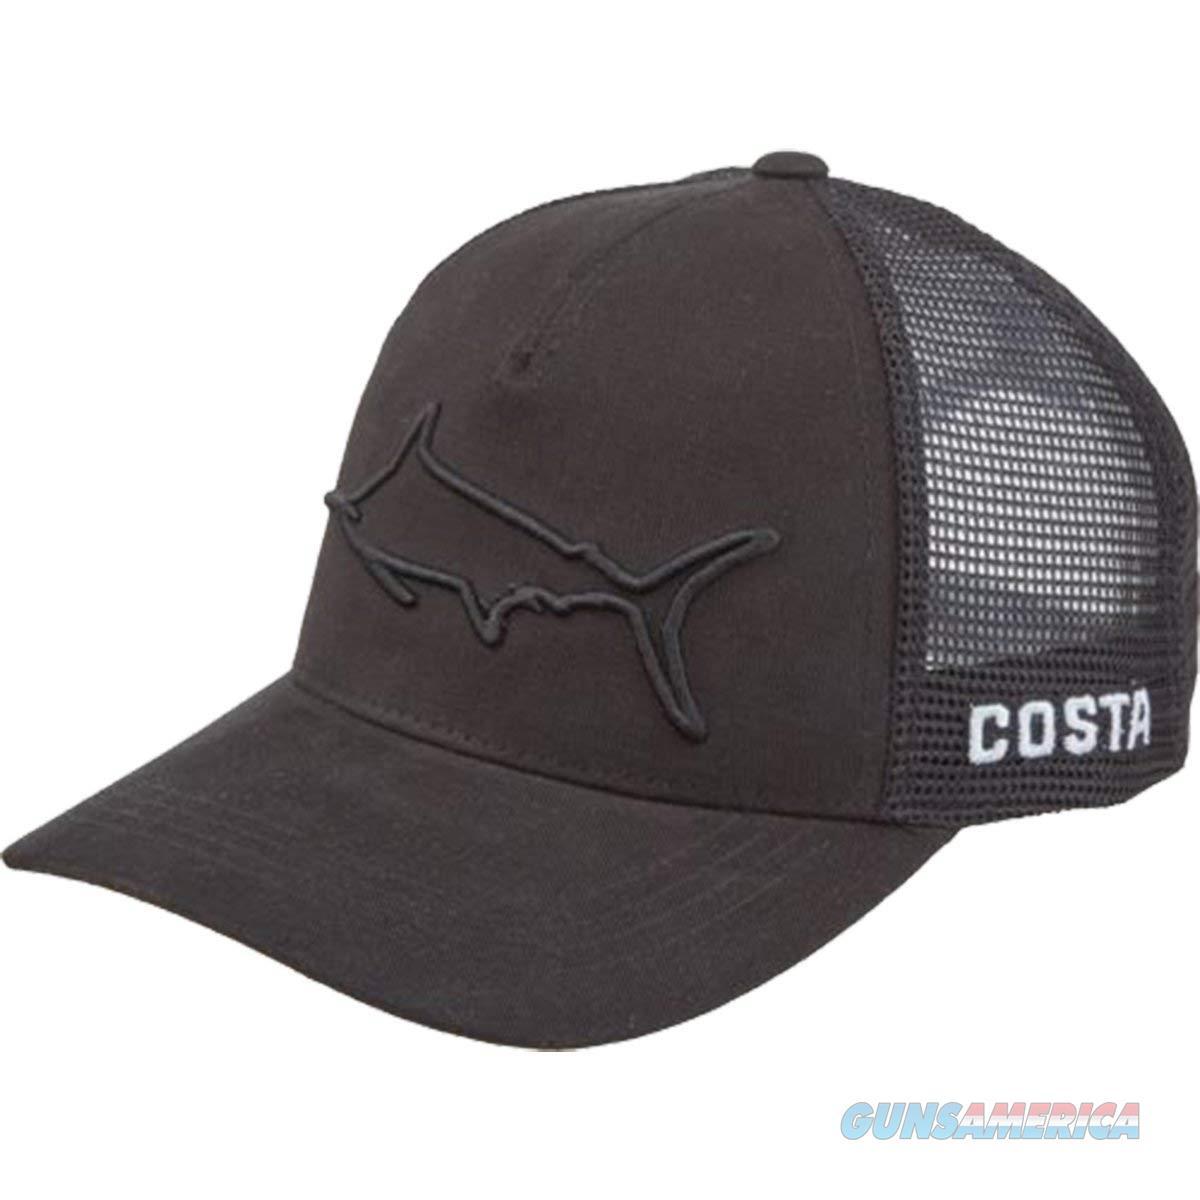 Costa Stealth Marlin Trucker Hat Black For Sale